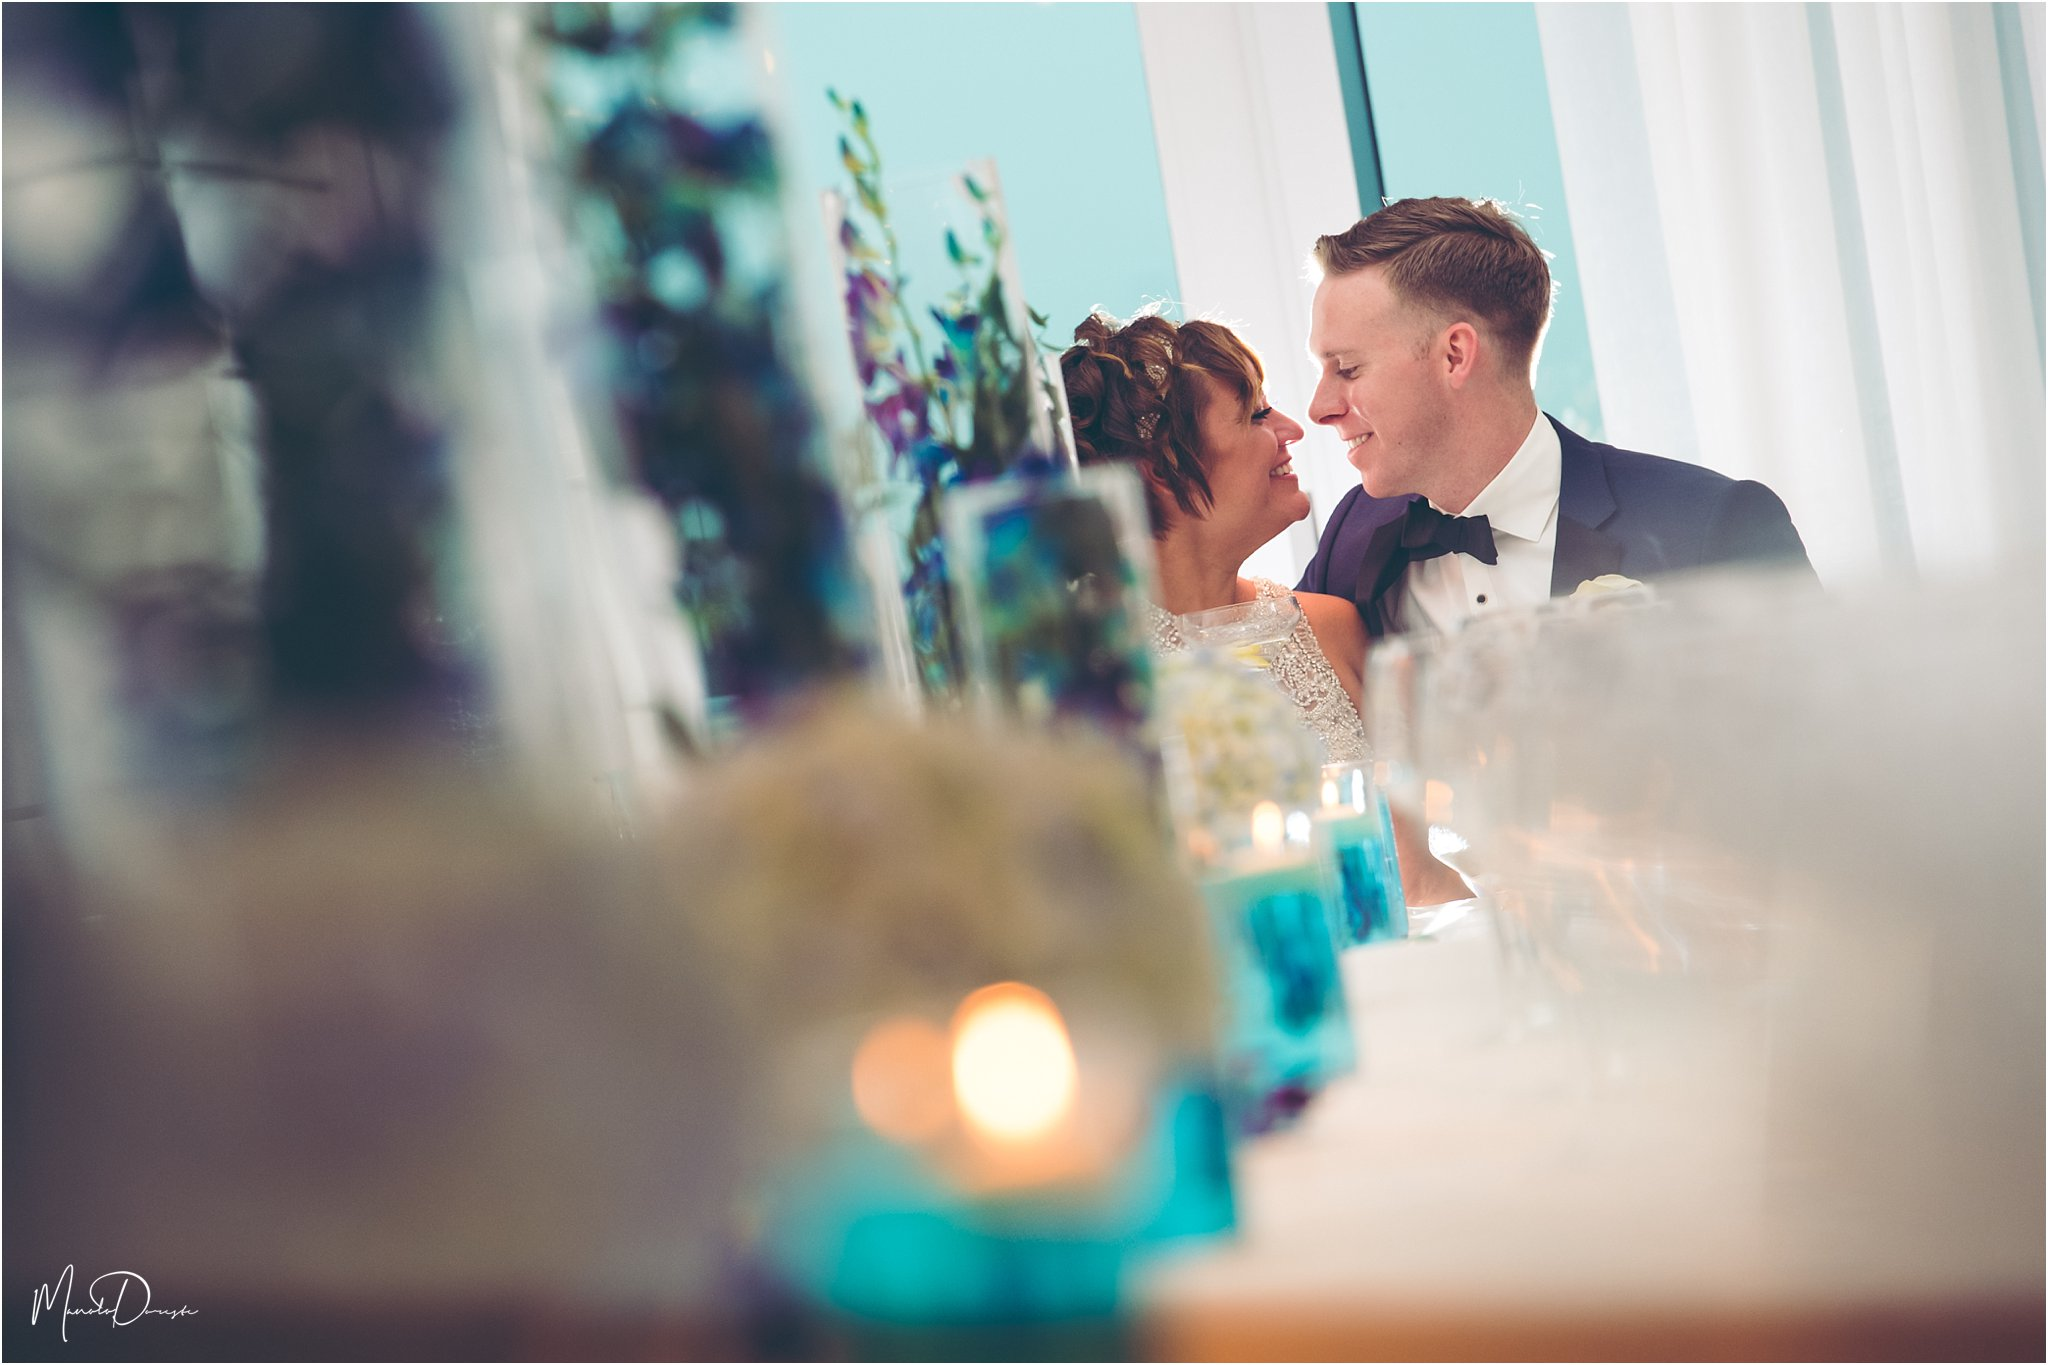 0456_ManoloDoreste_InFocusStudios_Wedding_Family_Photography_Miami_MiamiPhotographer.jpg